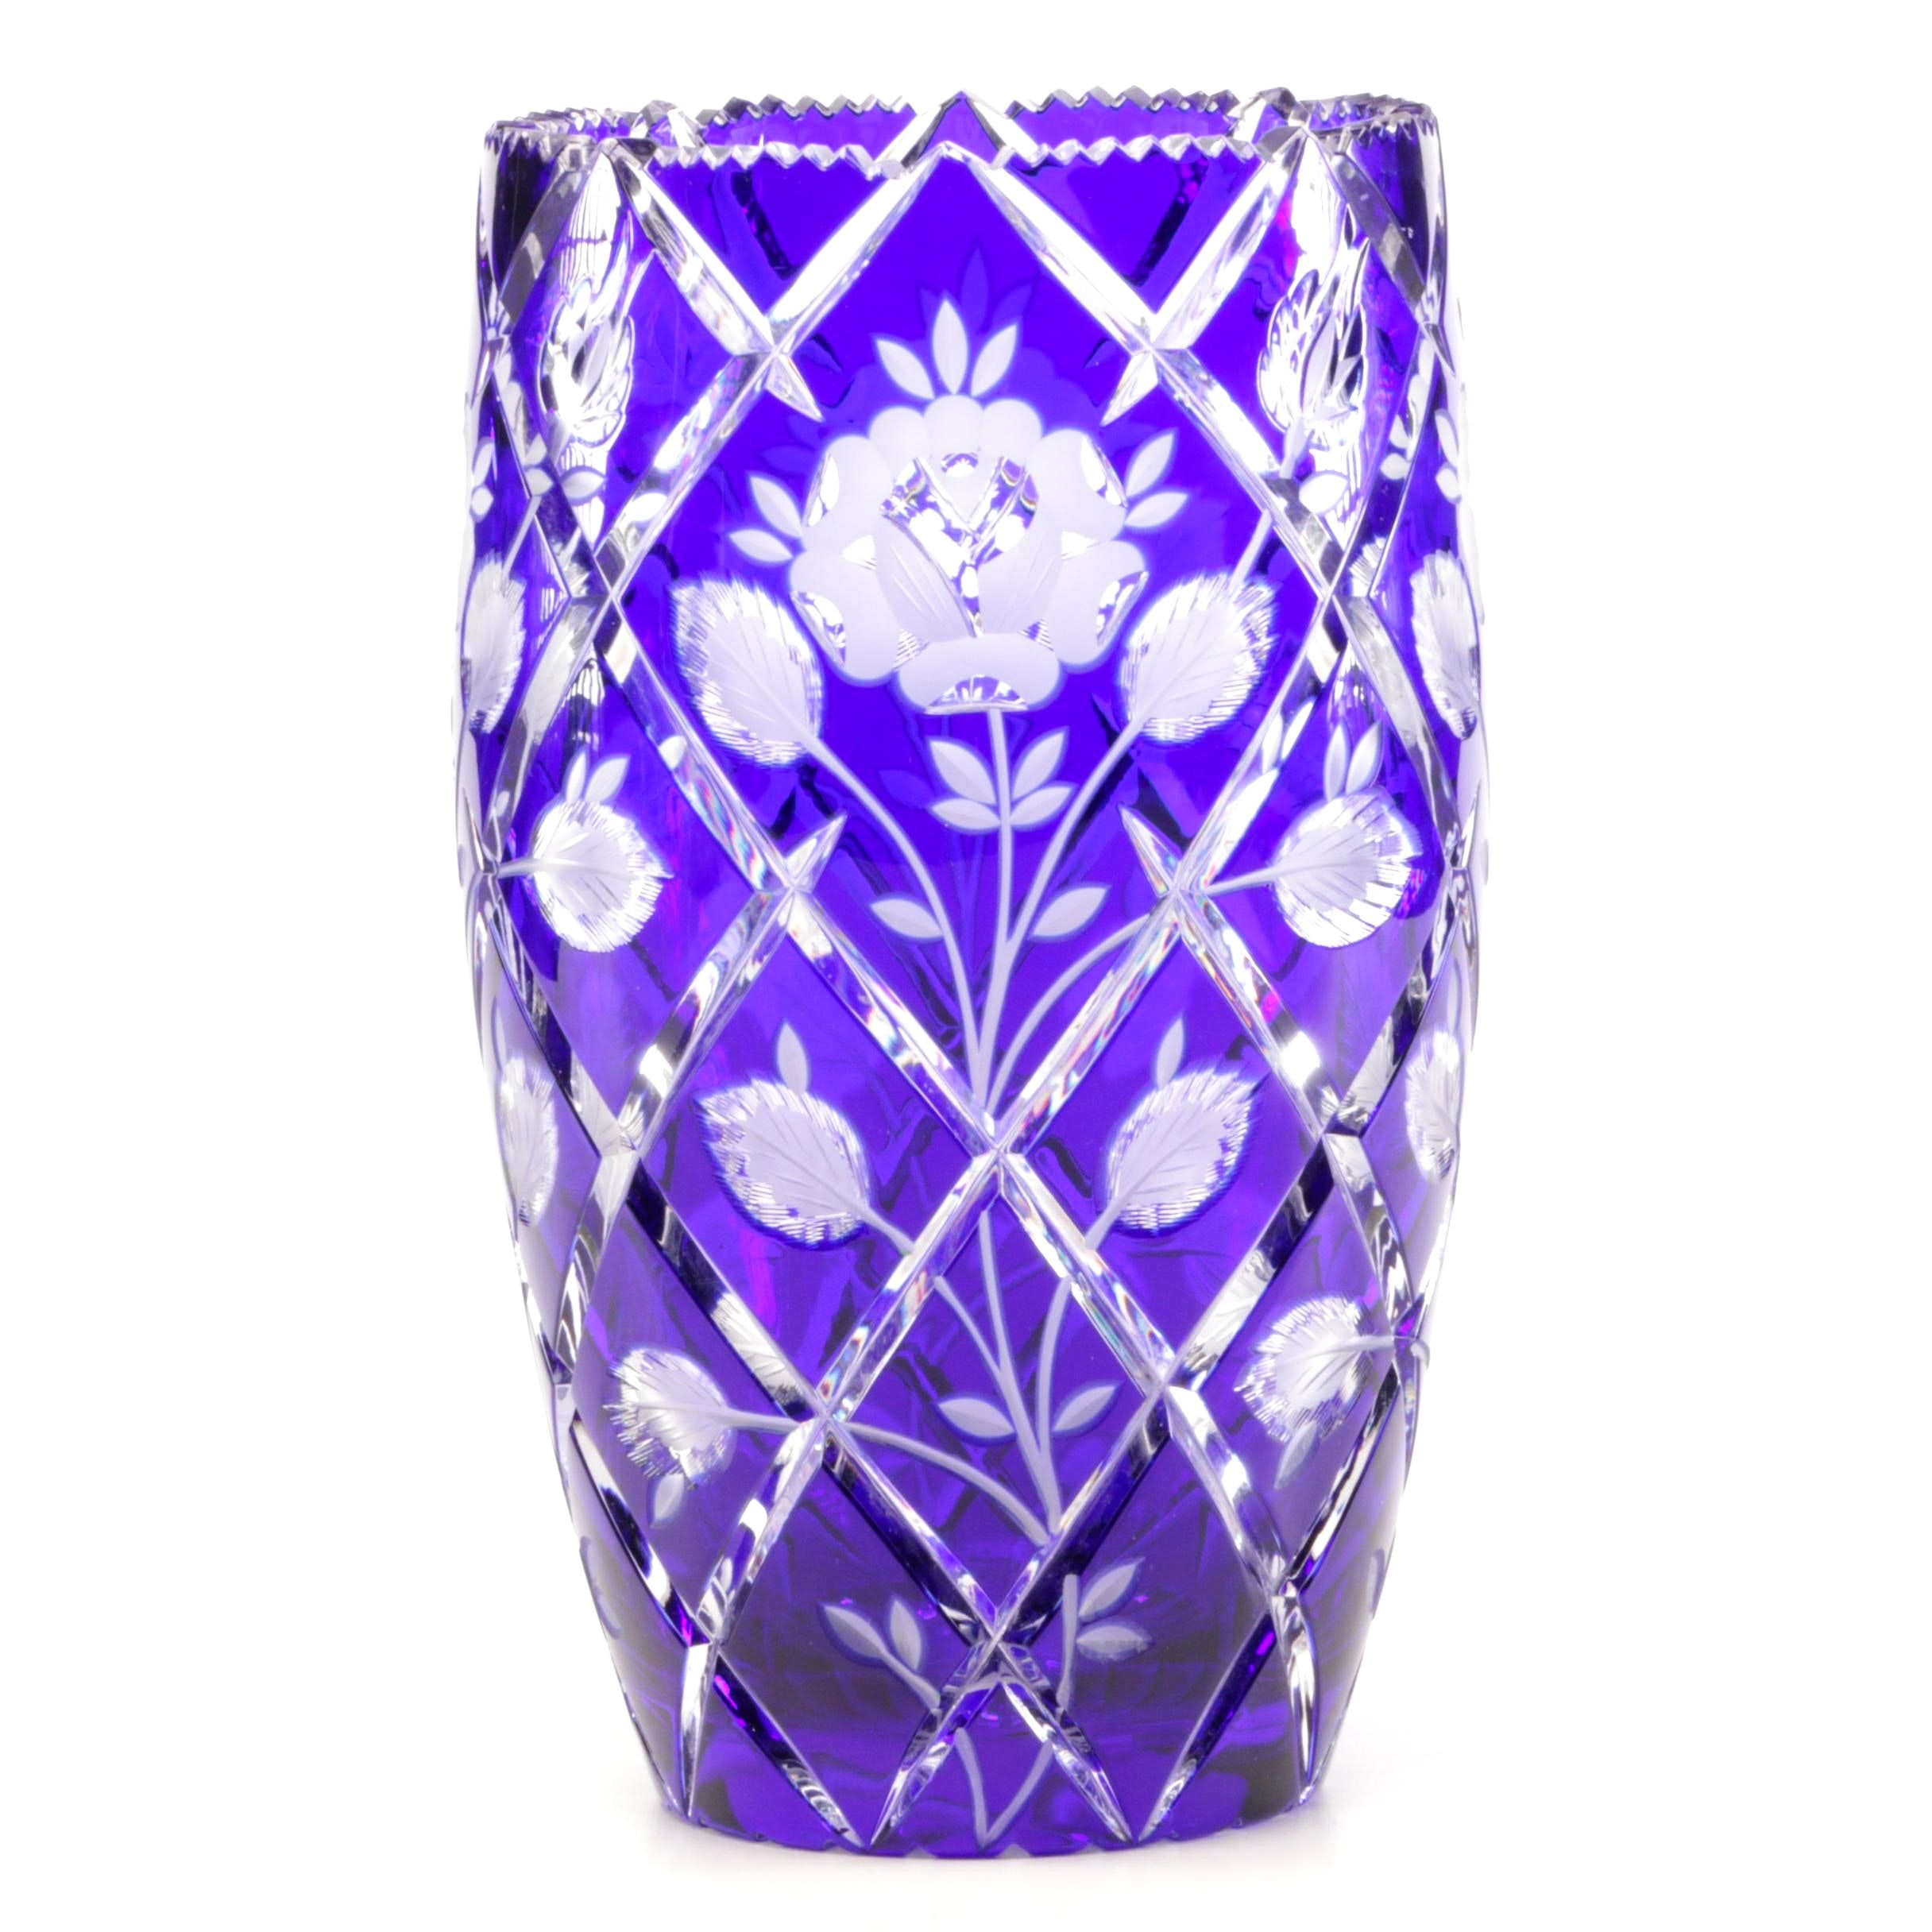 Cobalt Blue Cut to Clear Crystal Vase